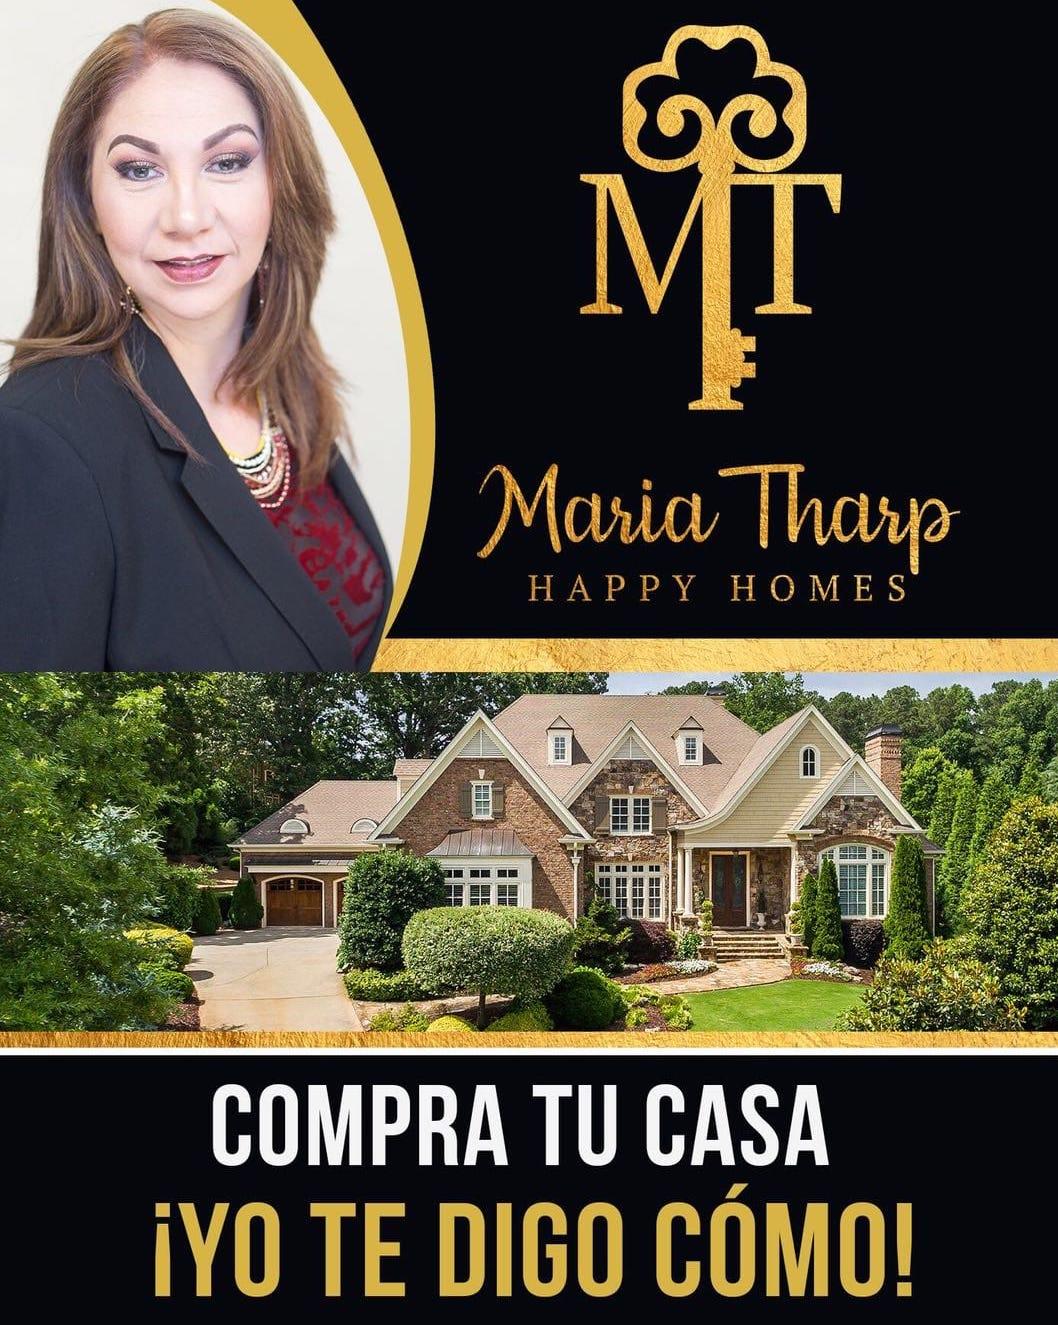 Compra tu Casa Yo te Digo como Soy Maria Tharp